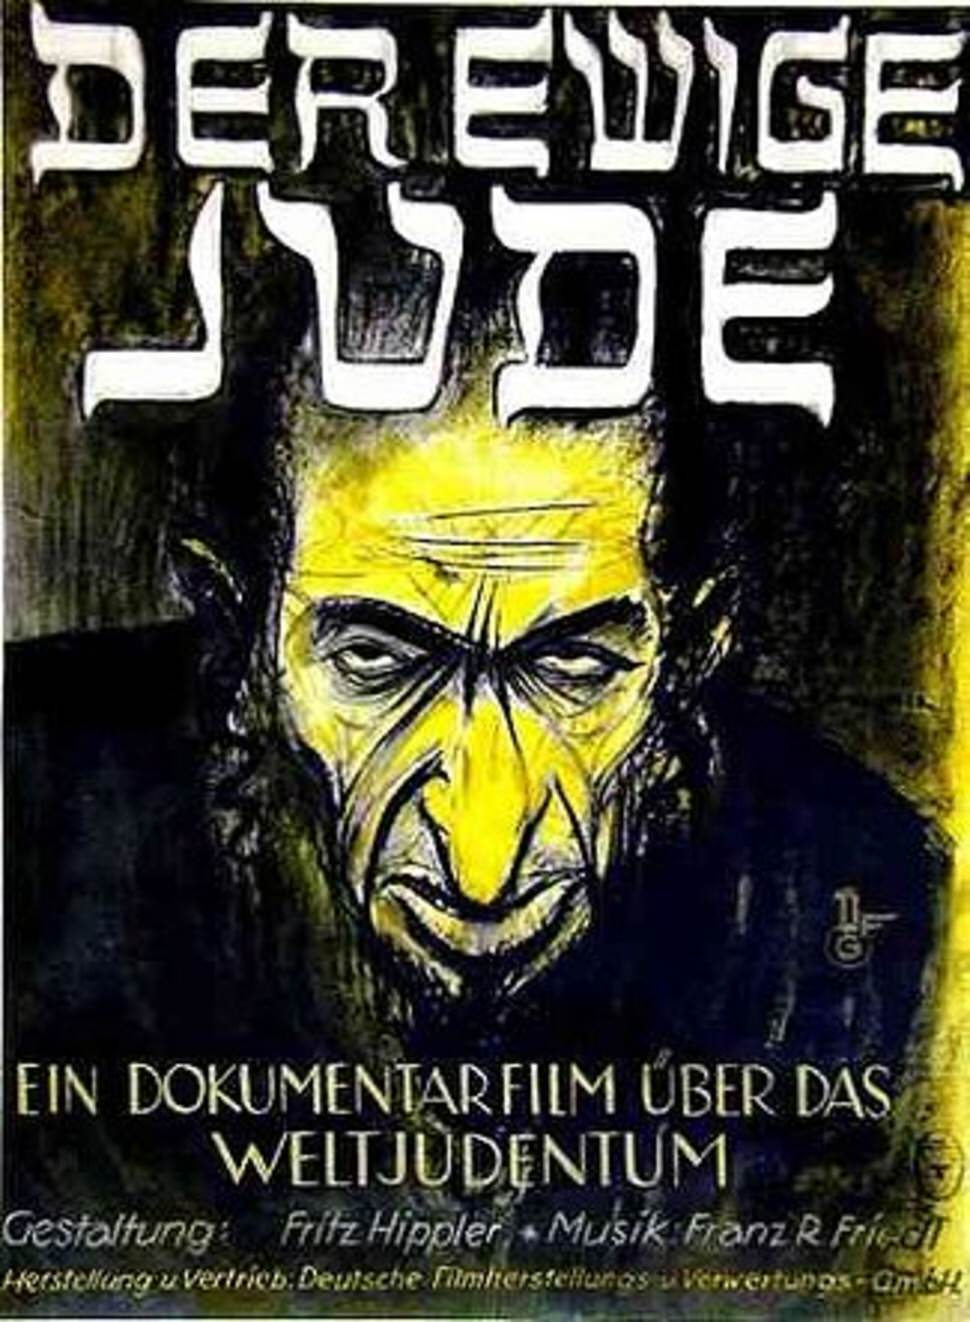 https://cdn.nybooks.com/wp-content/uploads/2014/11/The-Eternal-Jew.jpg